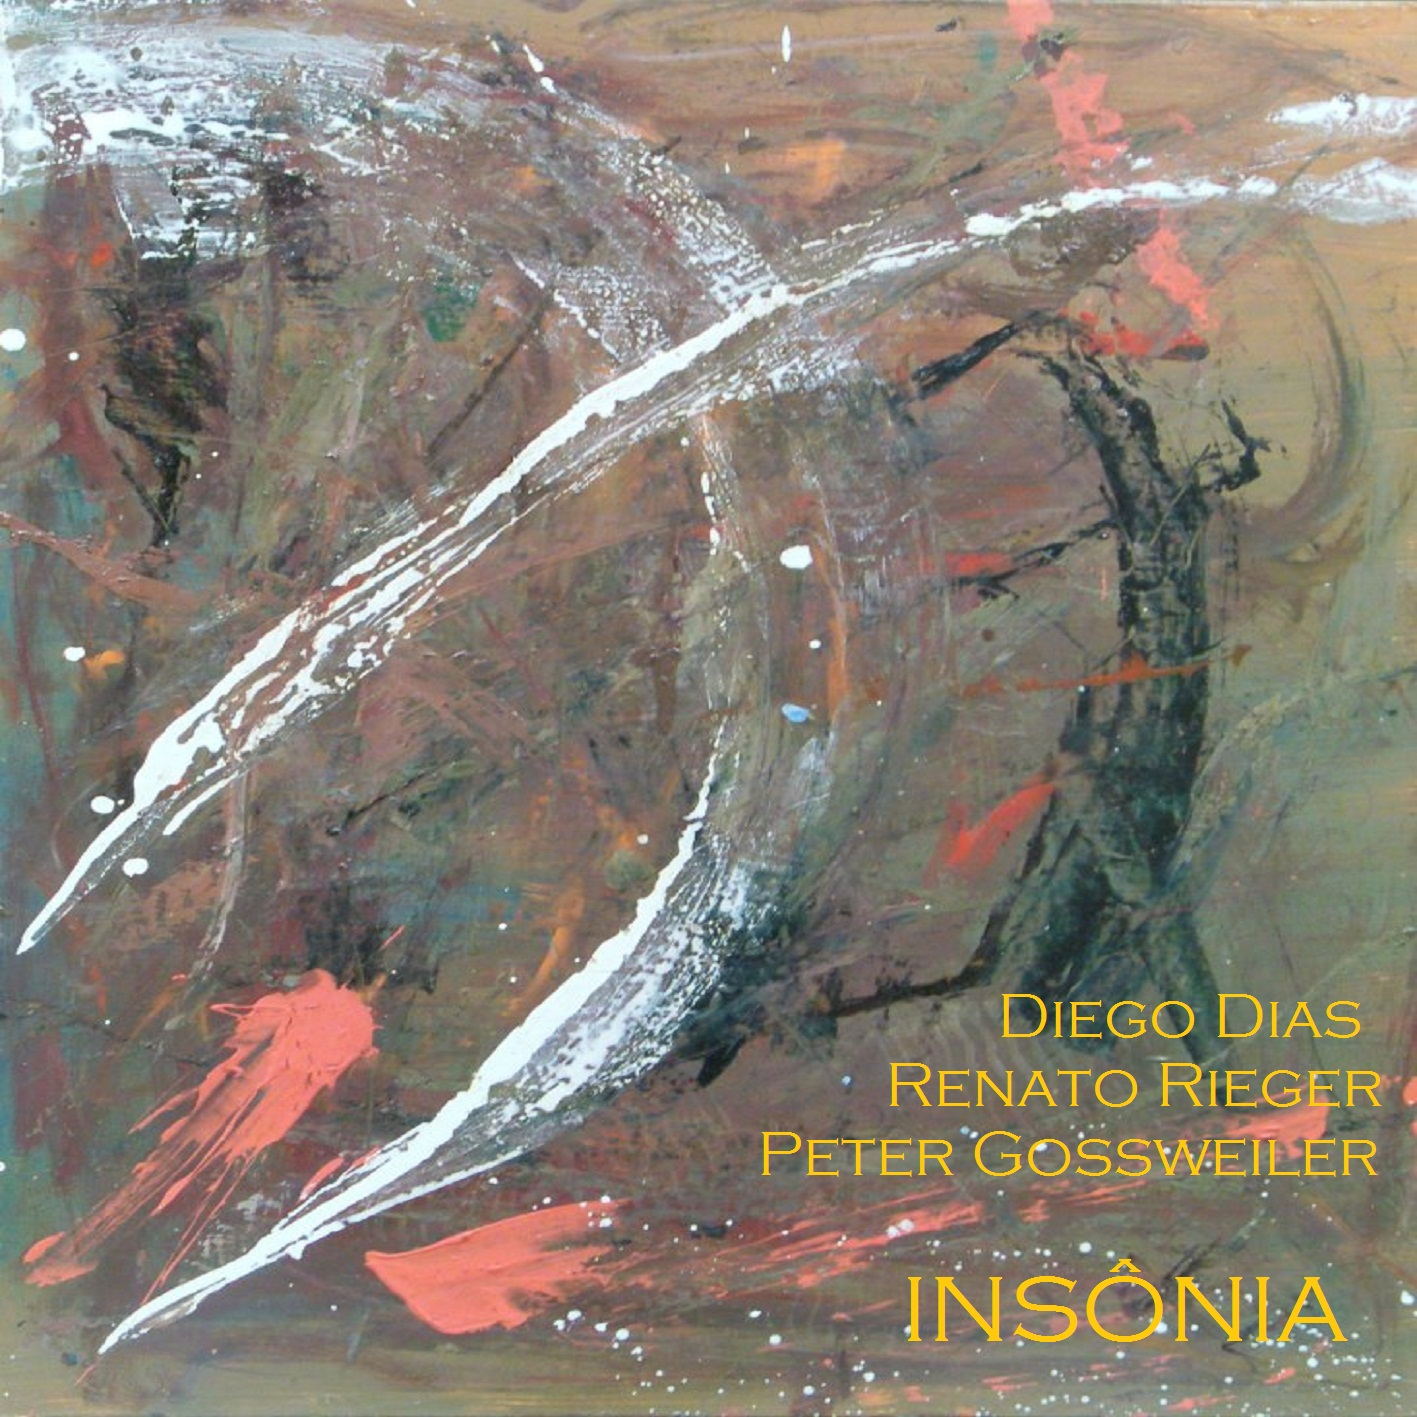 MSRCD029 - Diego Dias, Renato Rieger, Peter Gossweiler - Insônia